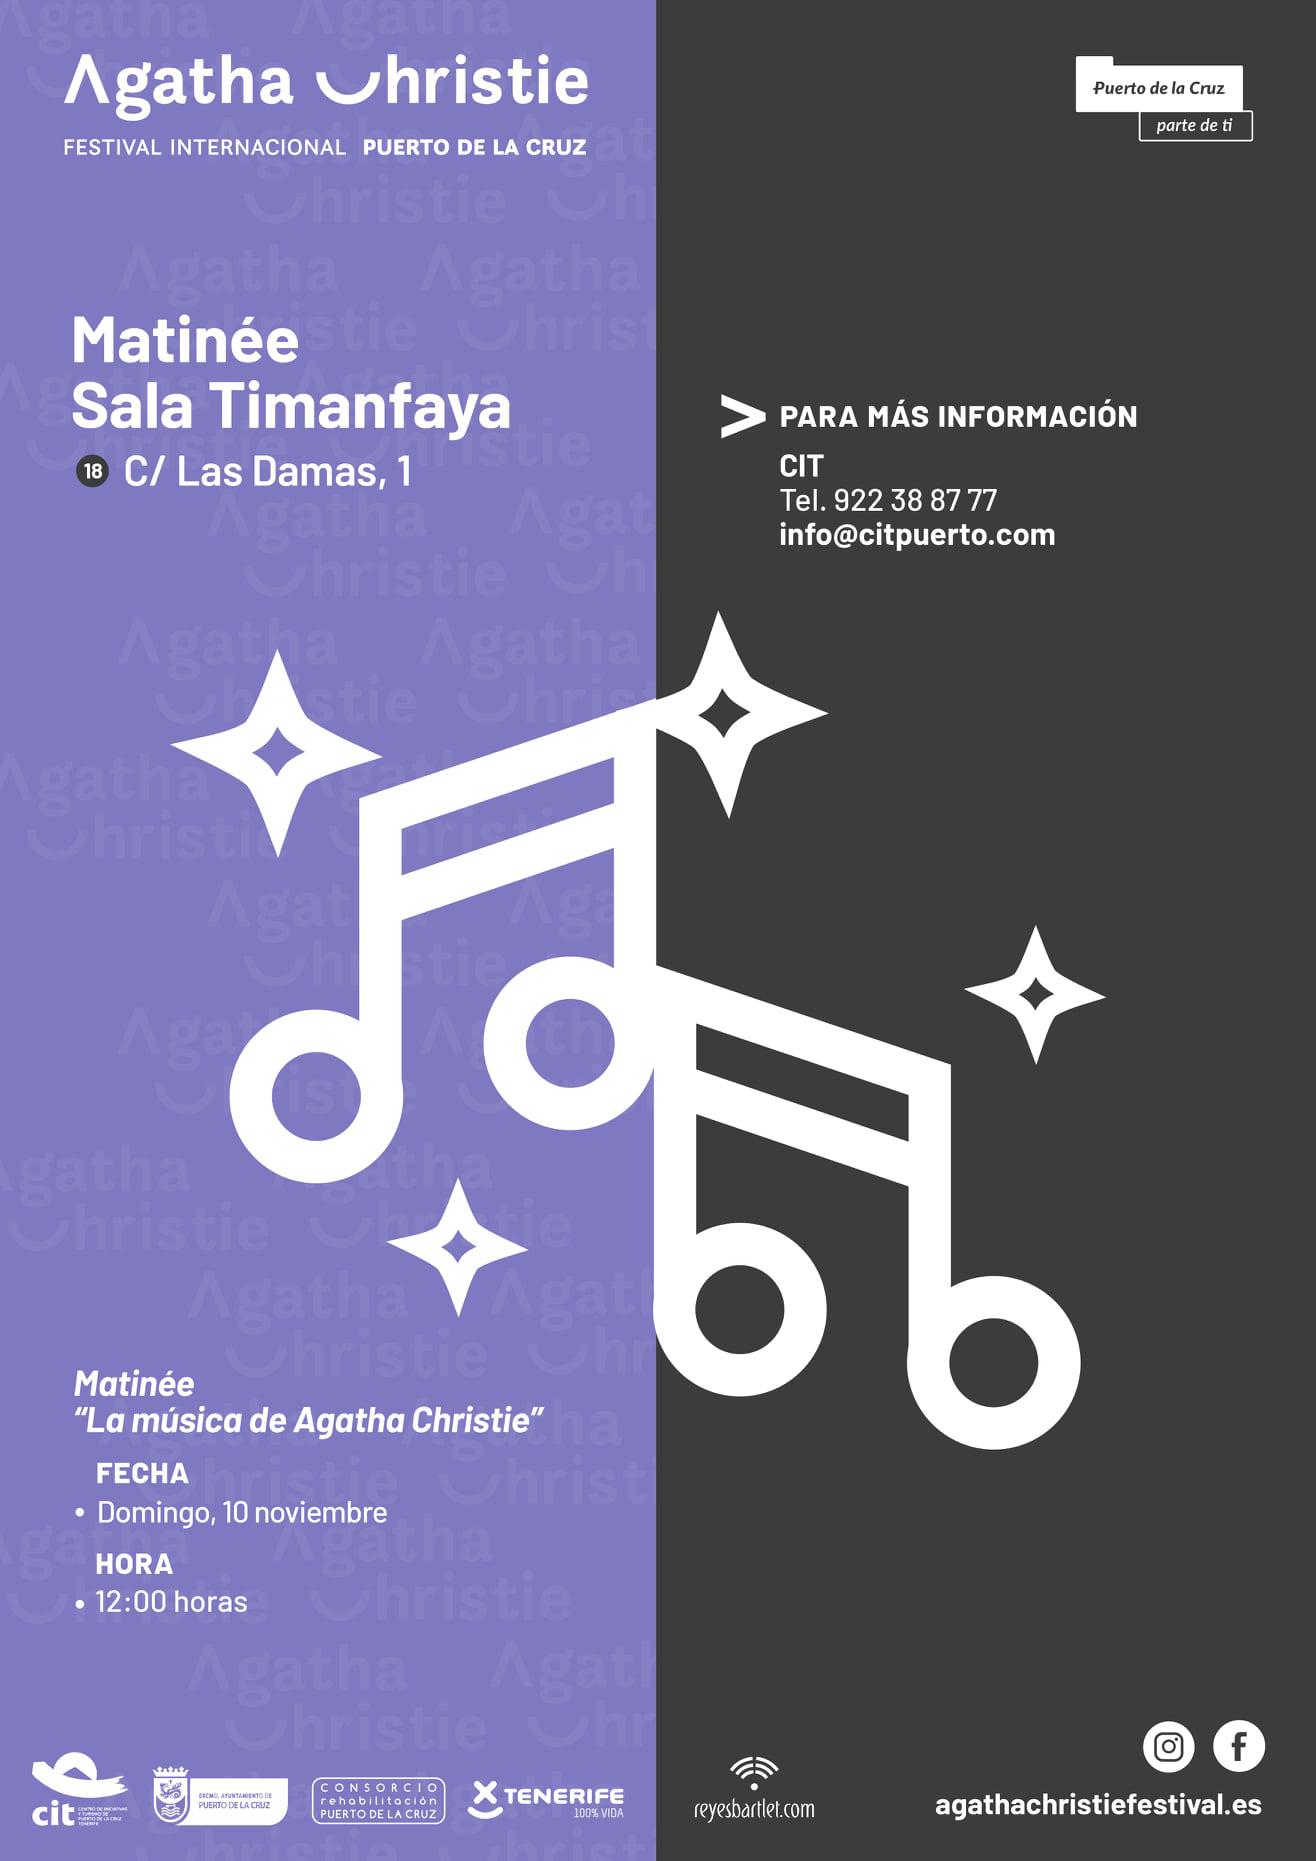 Matinée in Sala Timanfaya